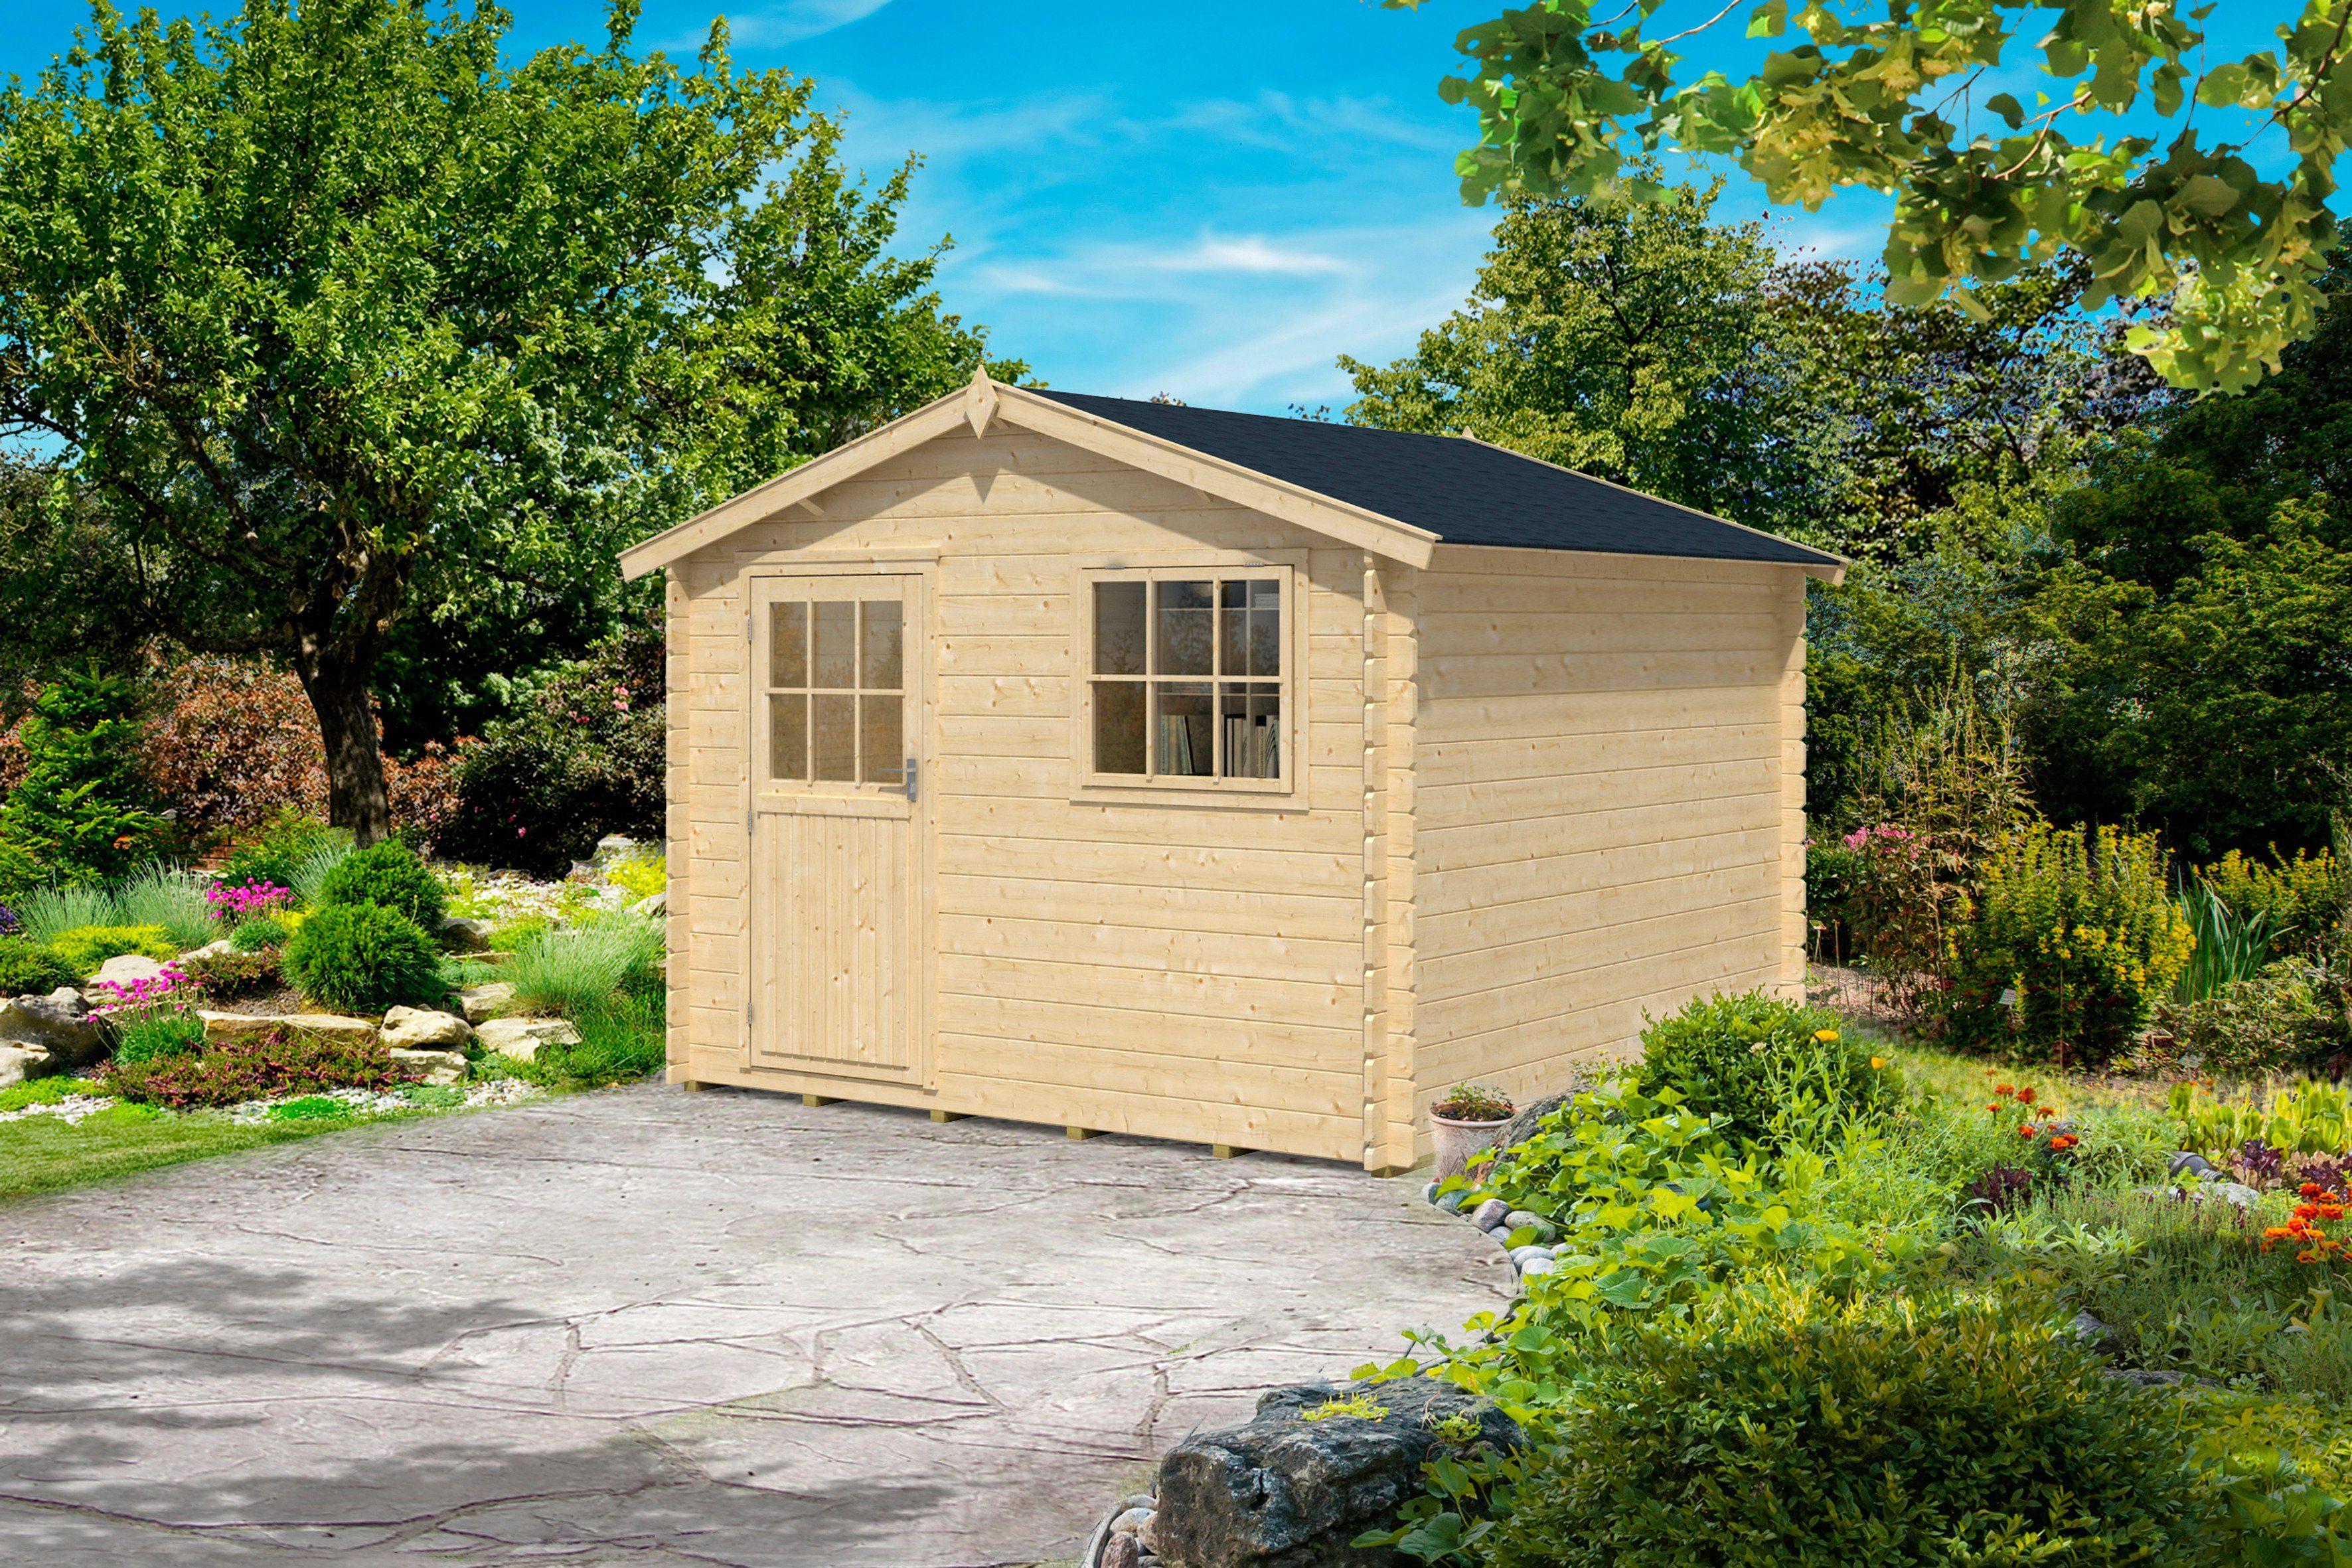 OUTDOOR LIFE PRODUCTS Gartenhaus »Mosel 3«, BxT: 300x300 cm